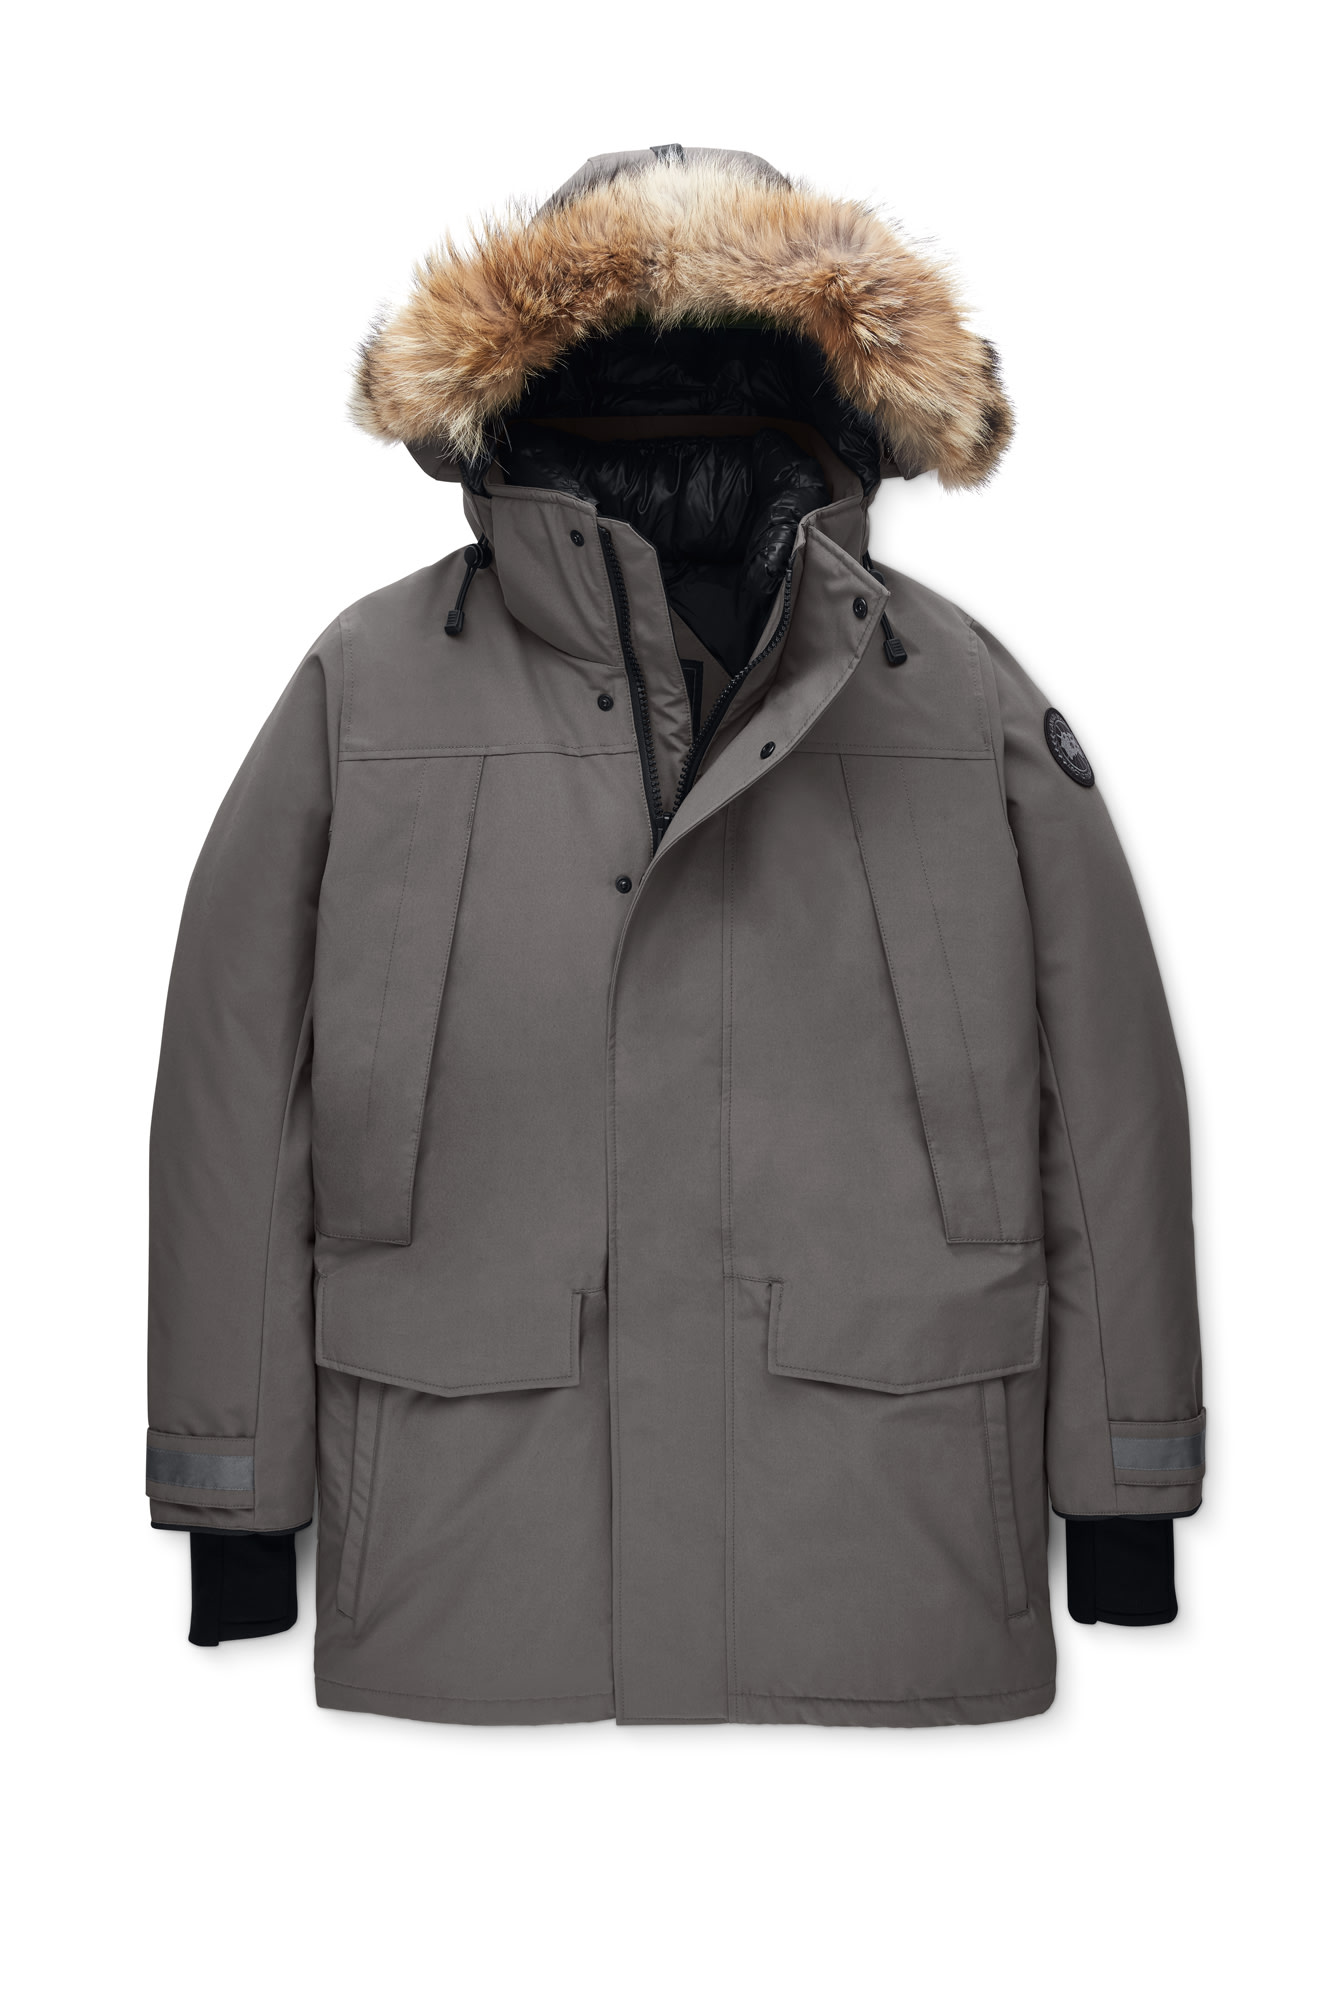 GIOVANI & RICCHI Designer Winterjacke Warme Jacke Parka mit